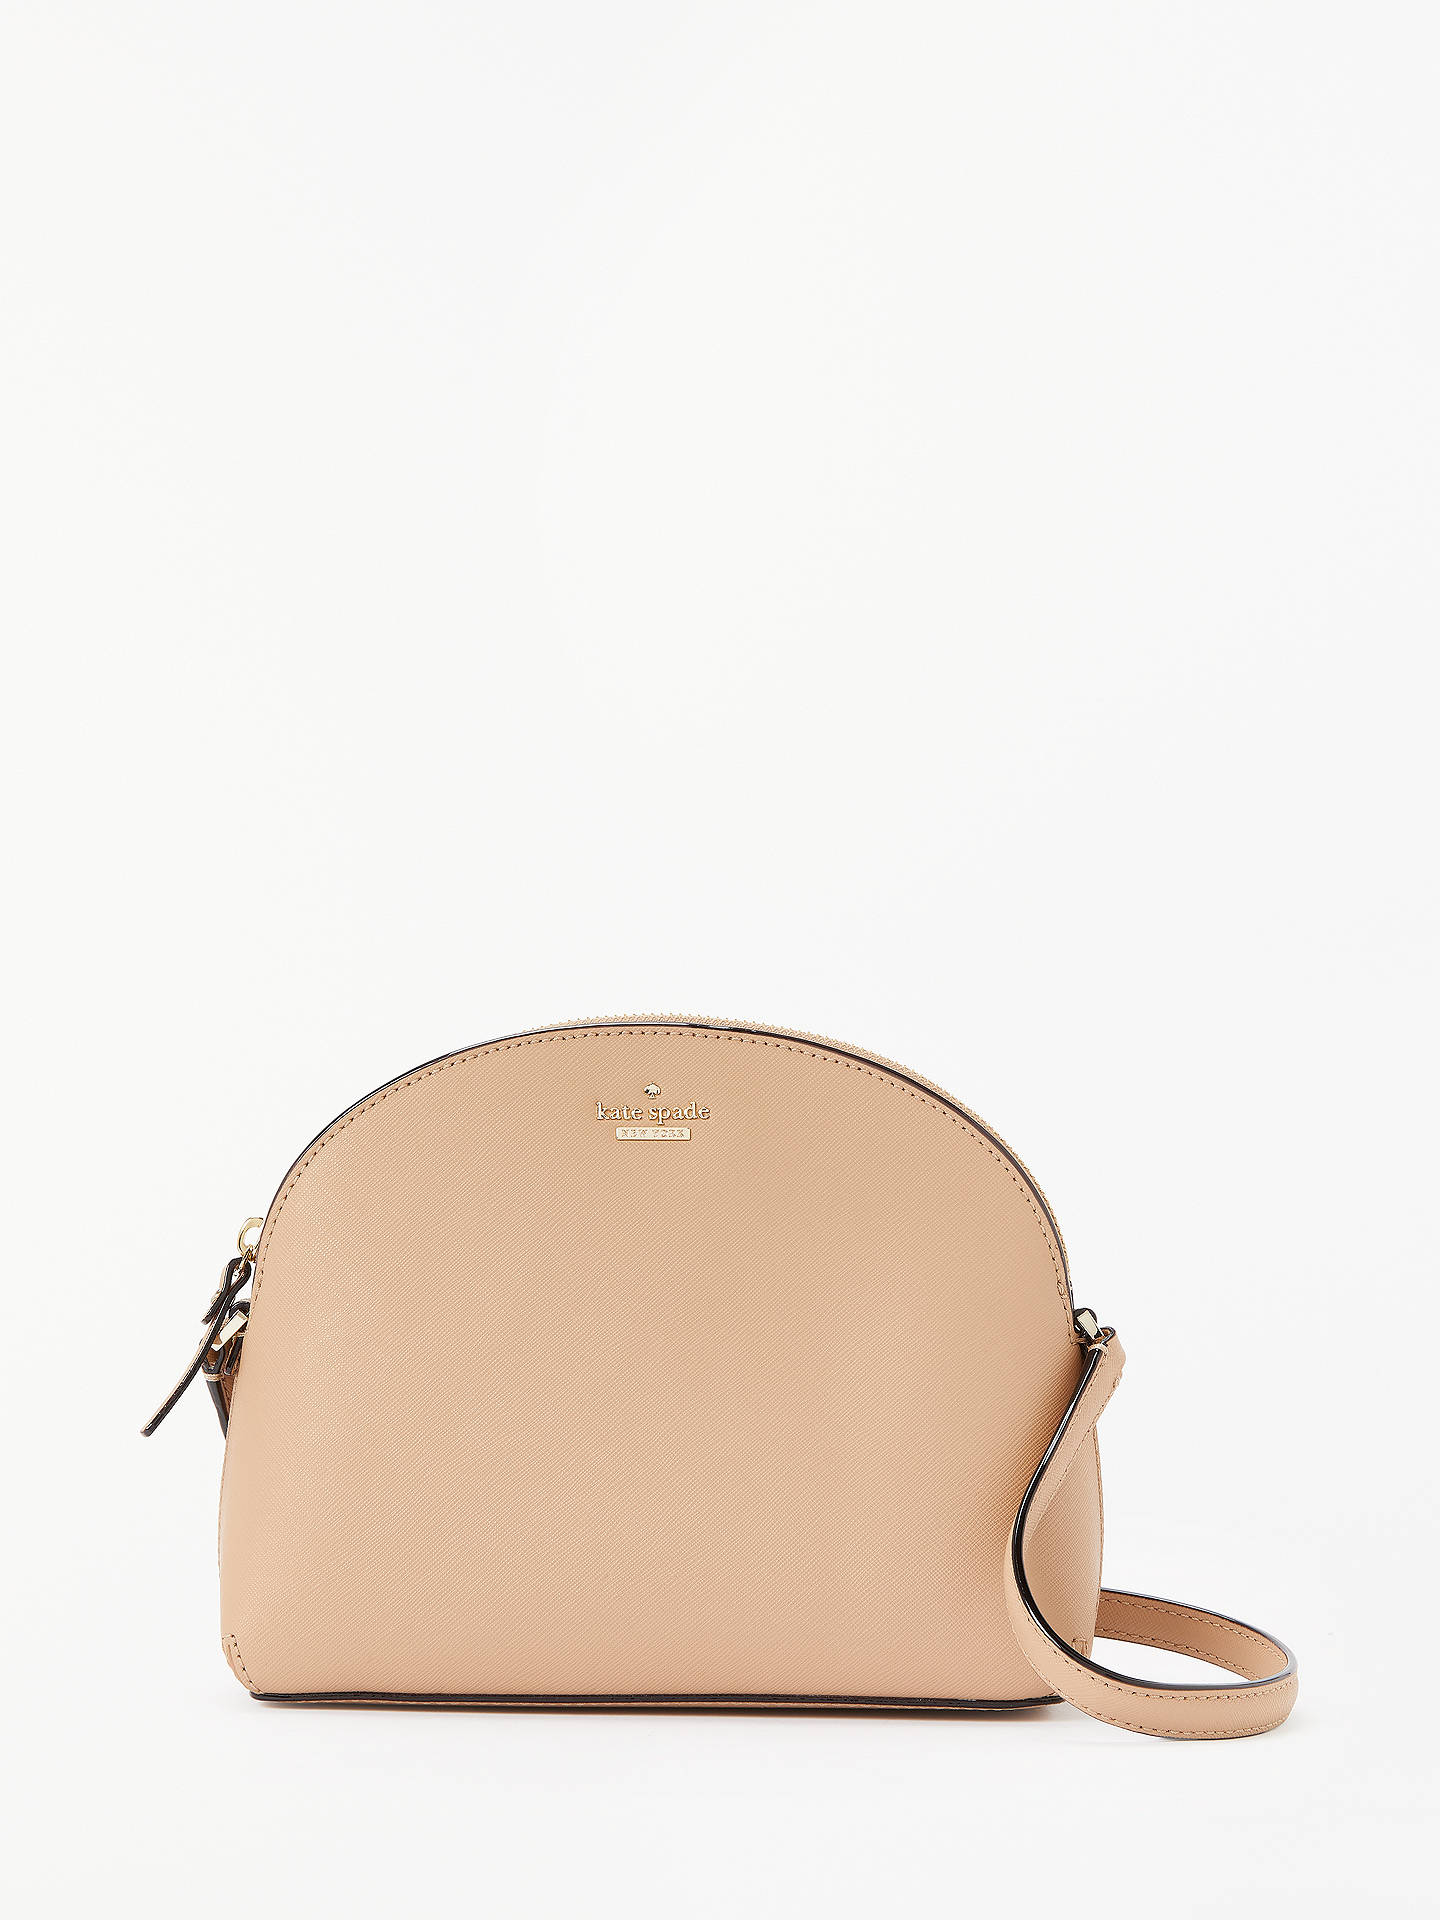 143c11414 Buy kate spade new york Cameron Street Hilli Large Leather Cross Body Bag,  Cashew Online ...